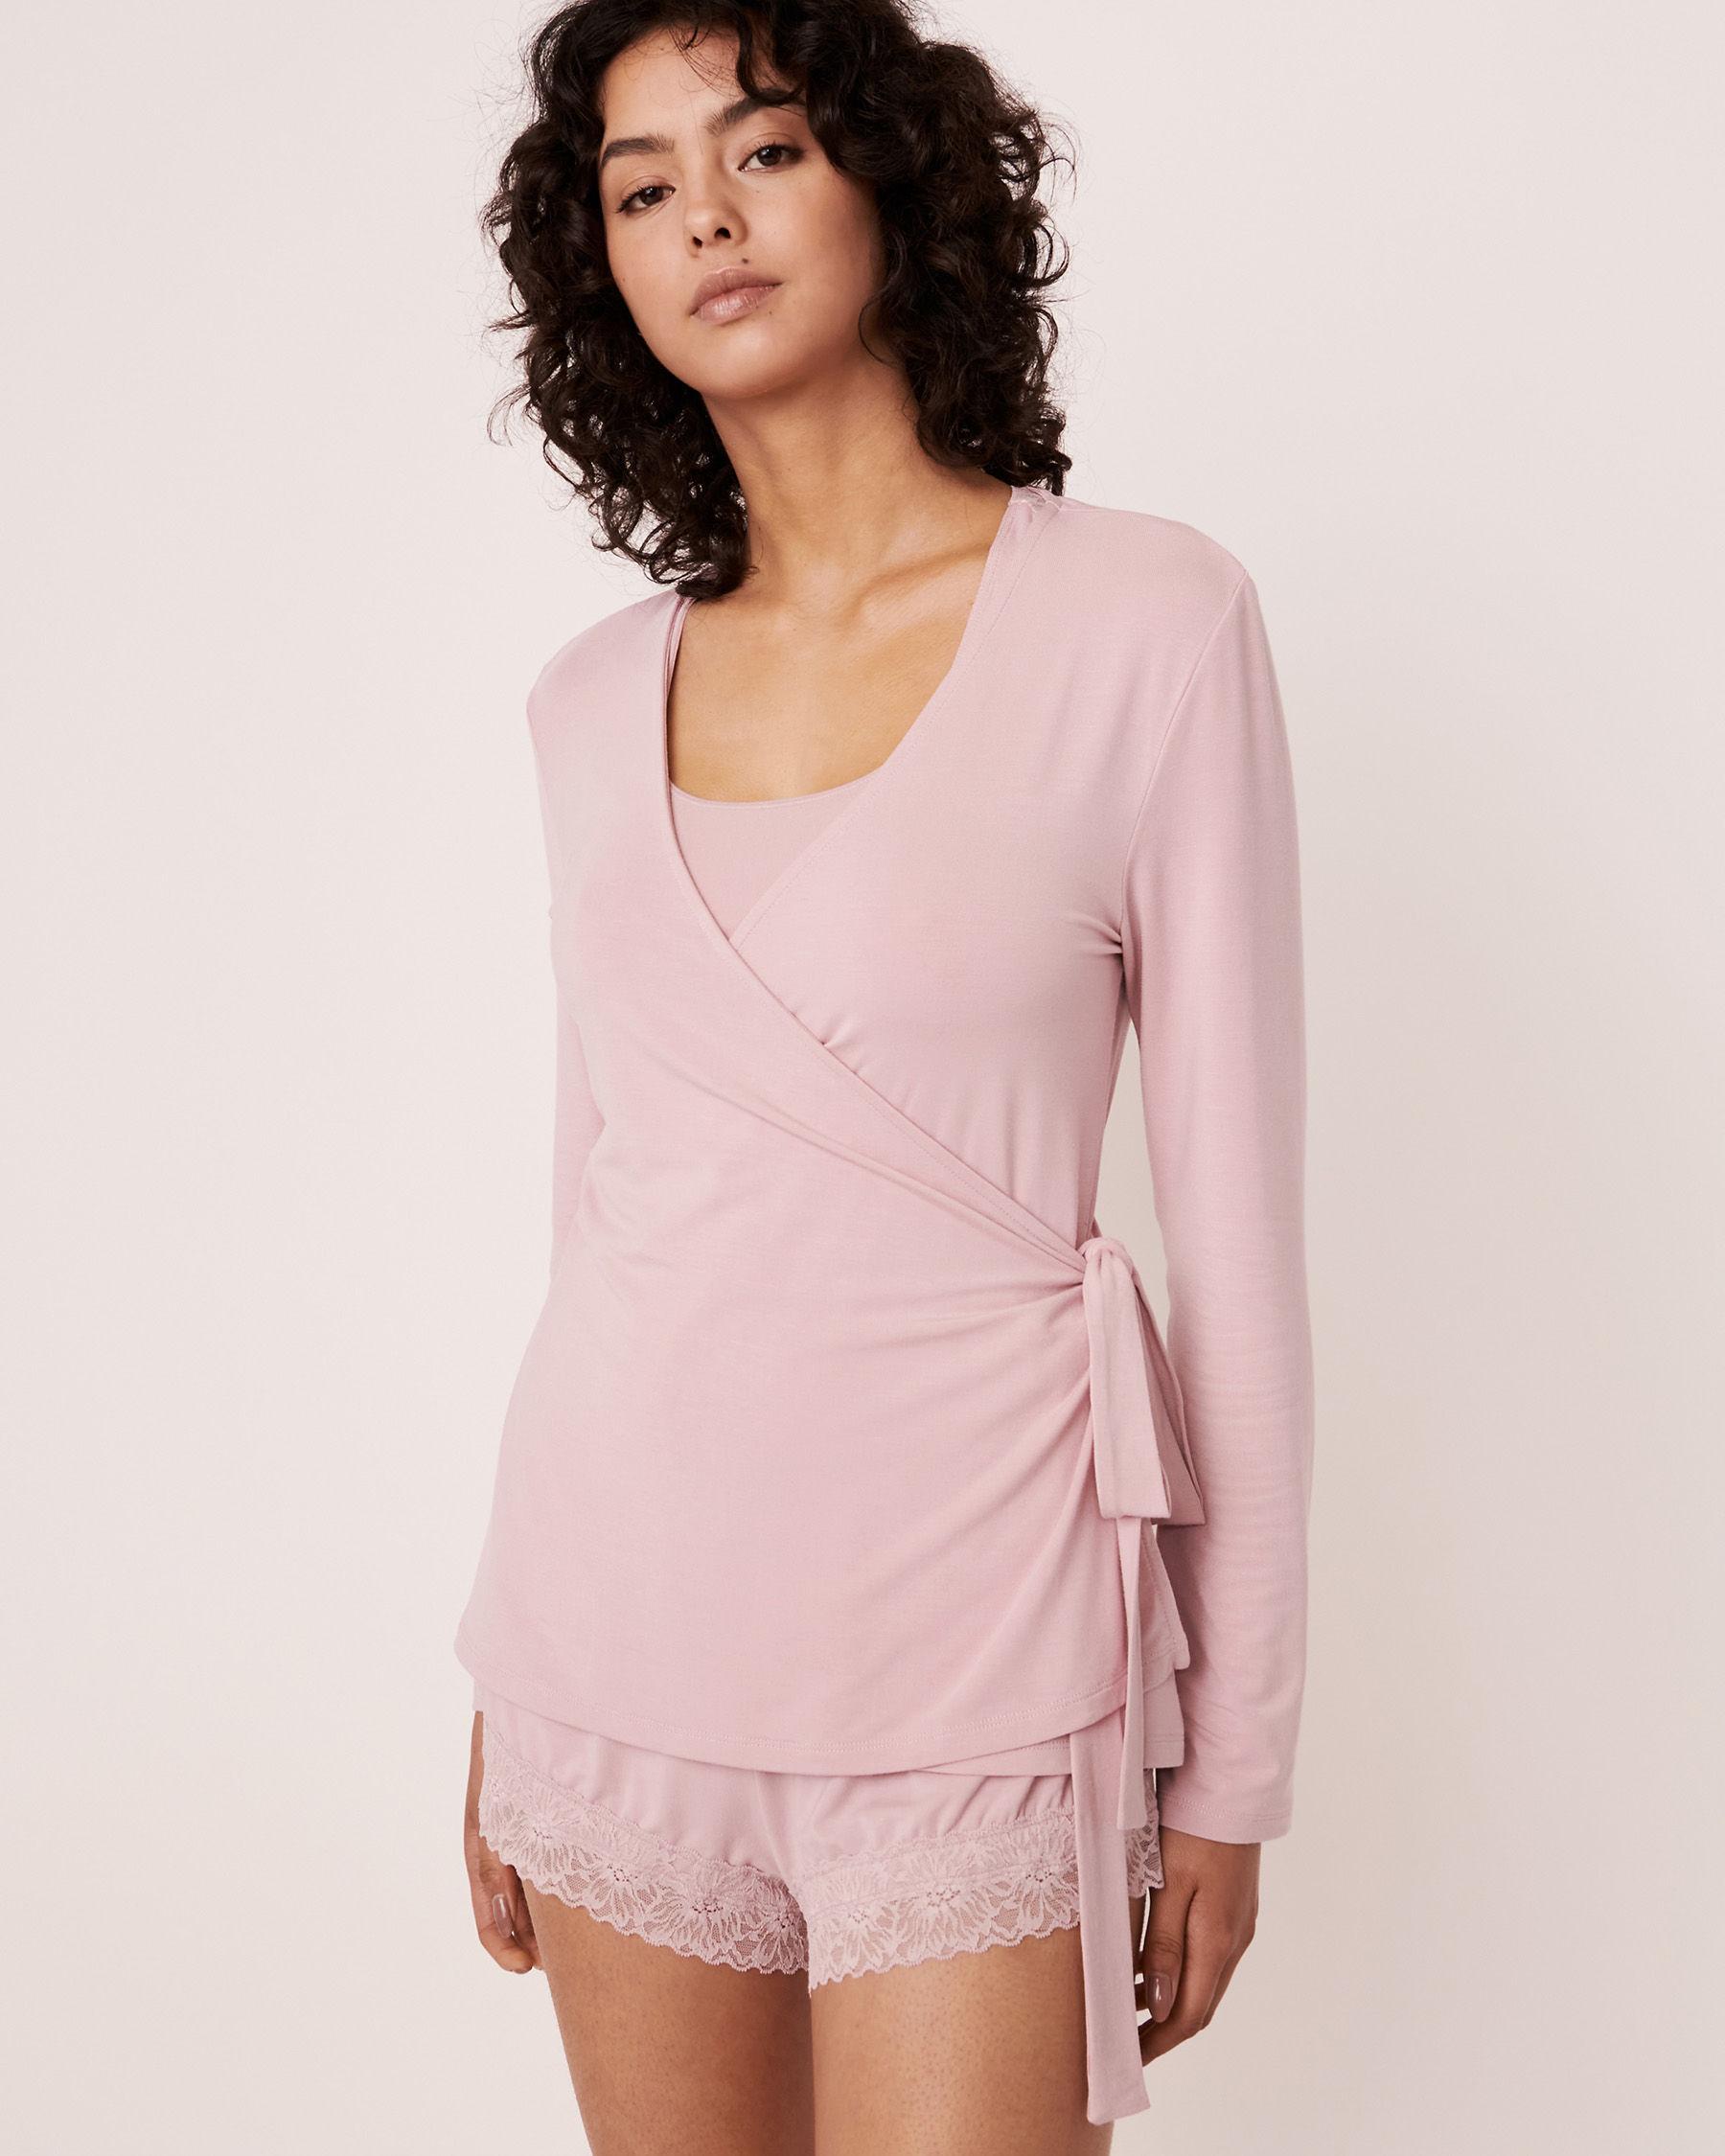 LA VIE EN ROSE Modal Wrap Over Long Sleeve Shirt Lilac 40100157 - View1